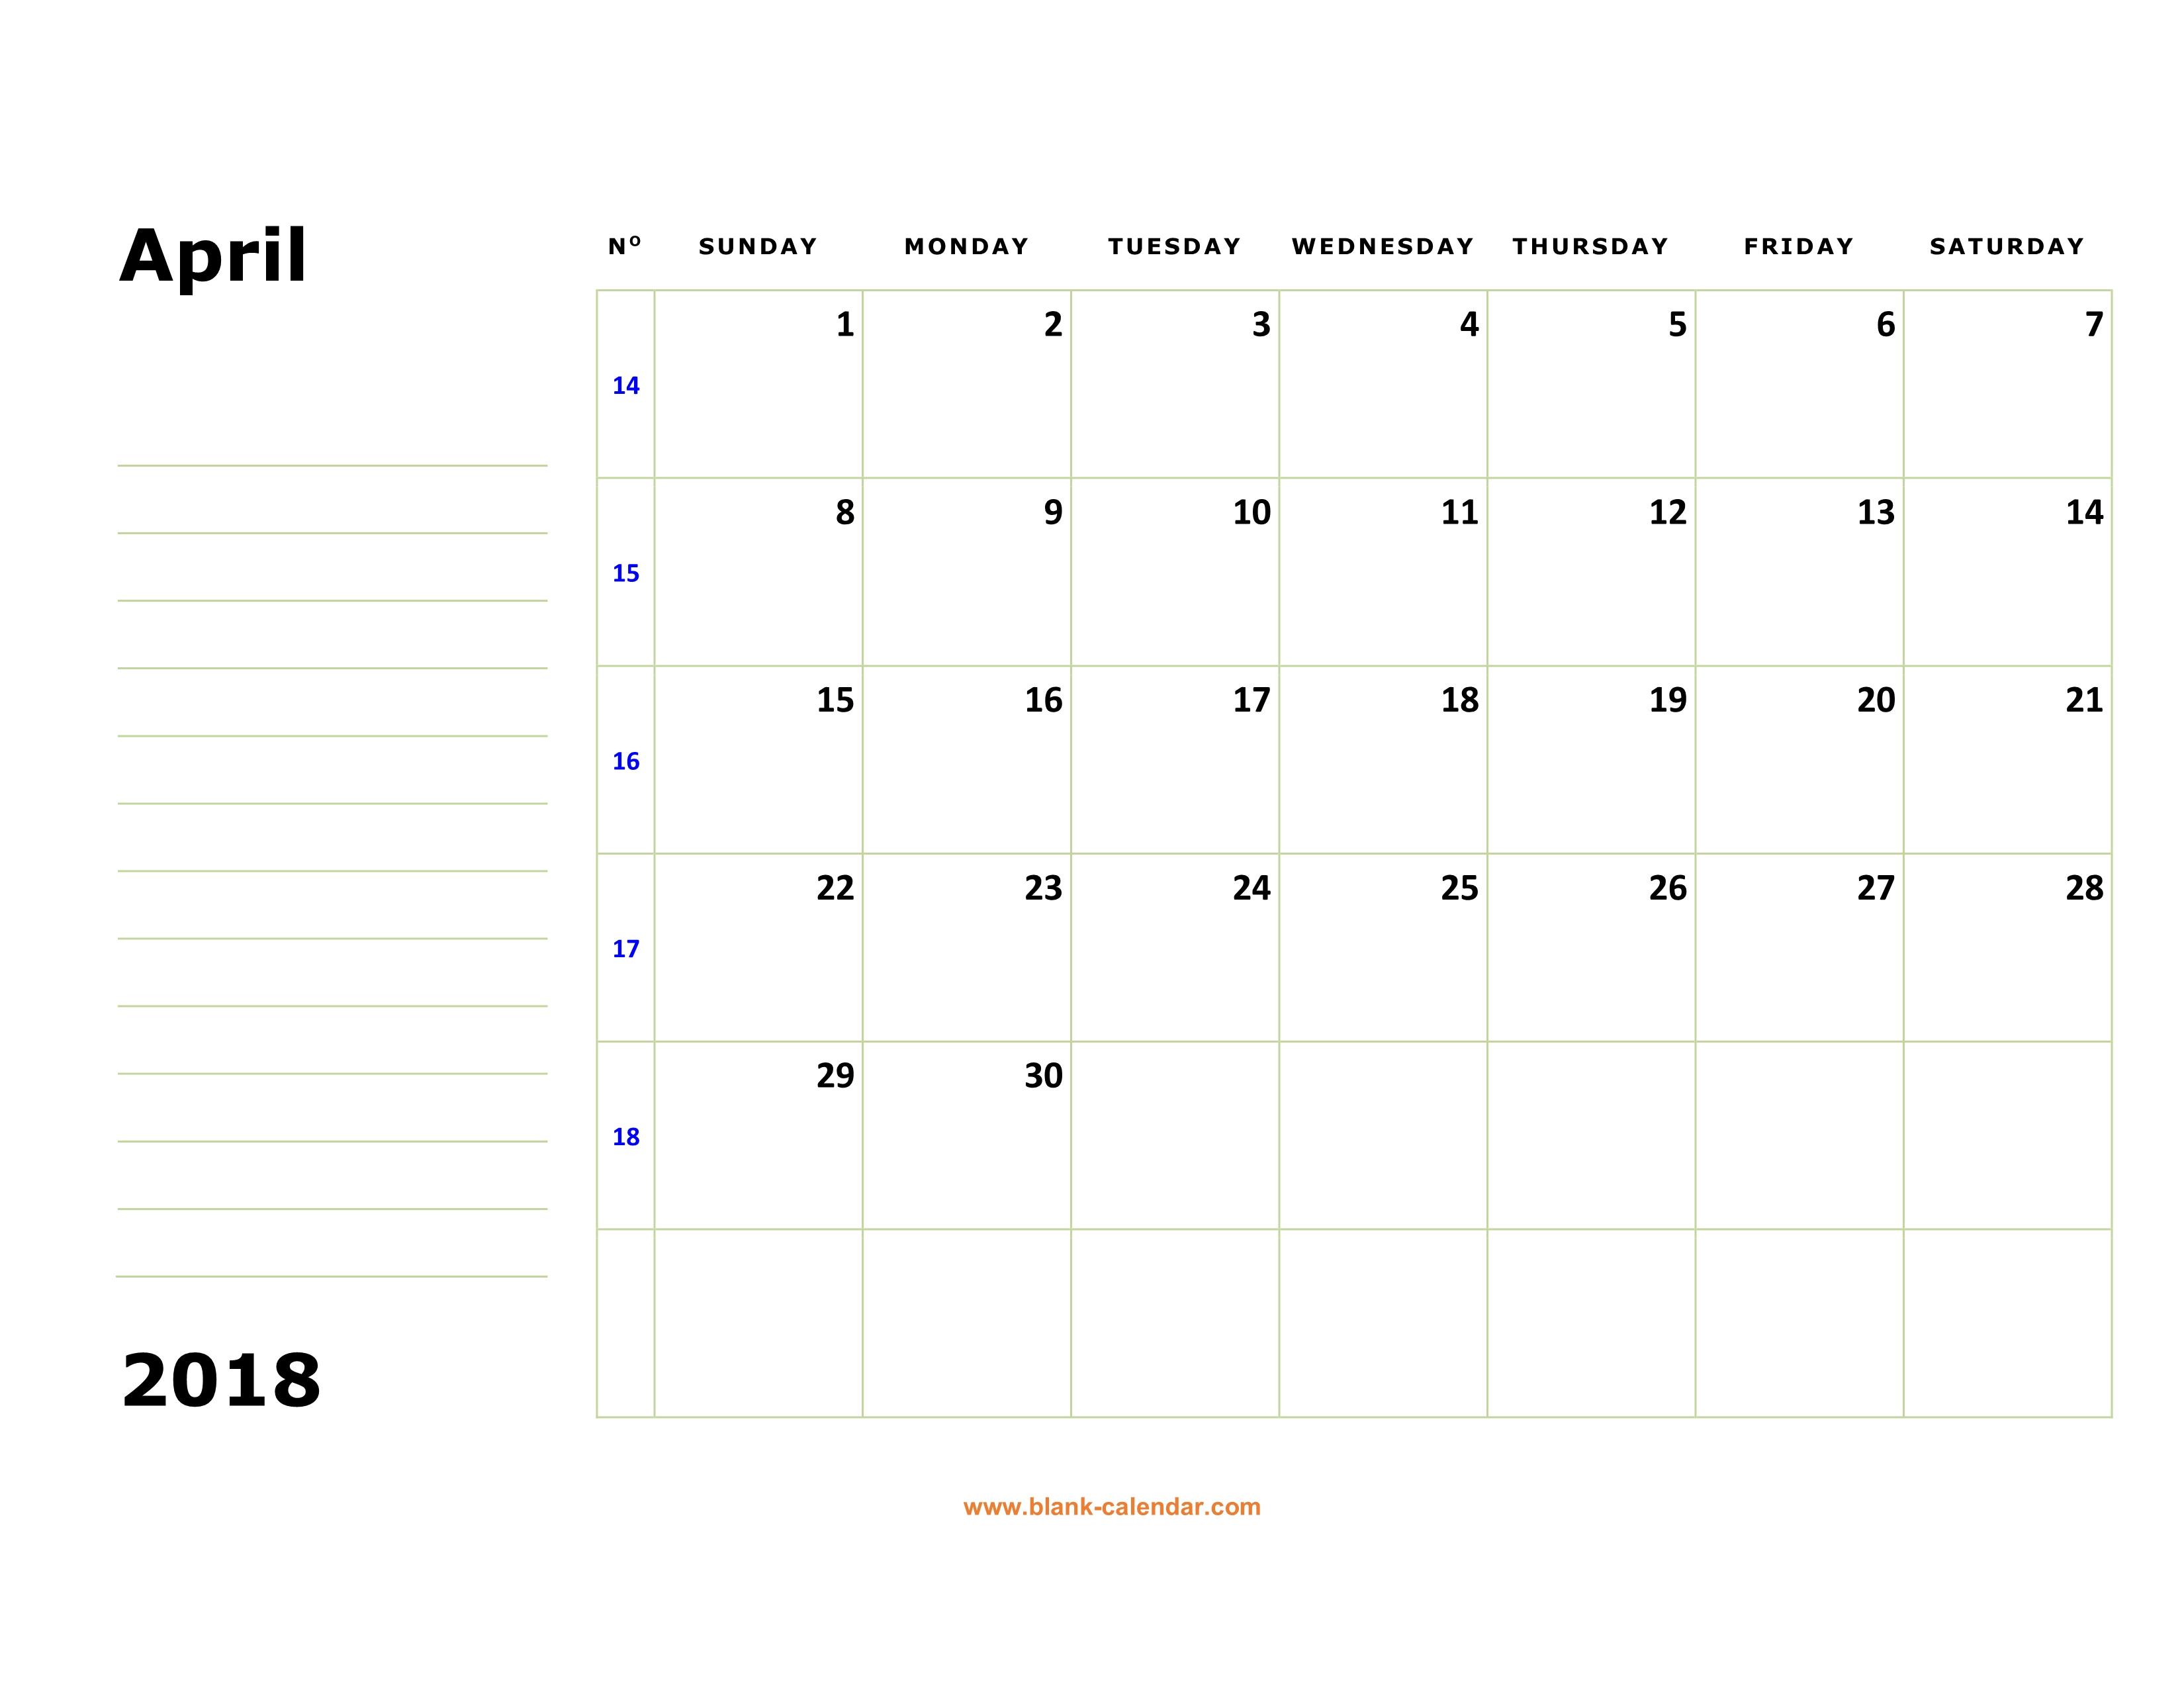 april 2018 calendar printable with holidays